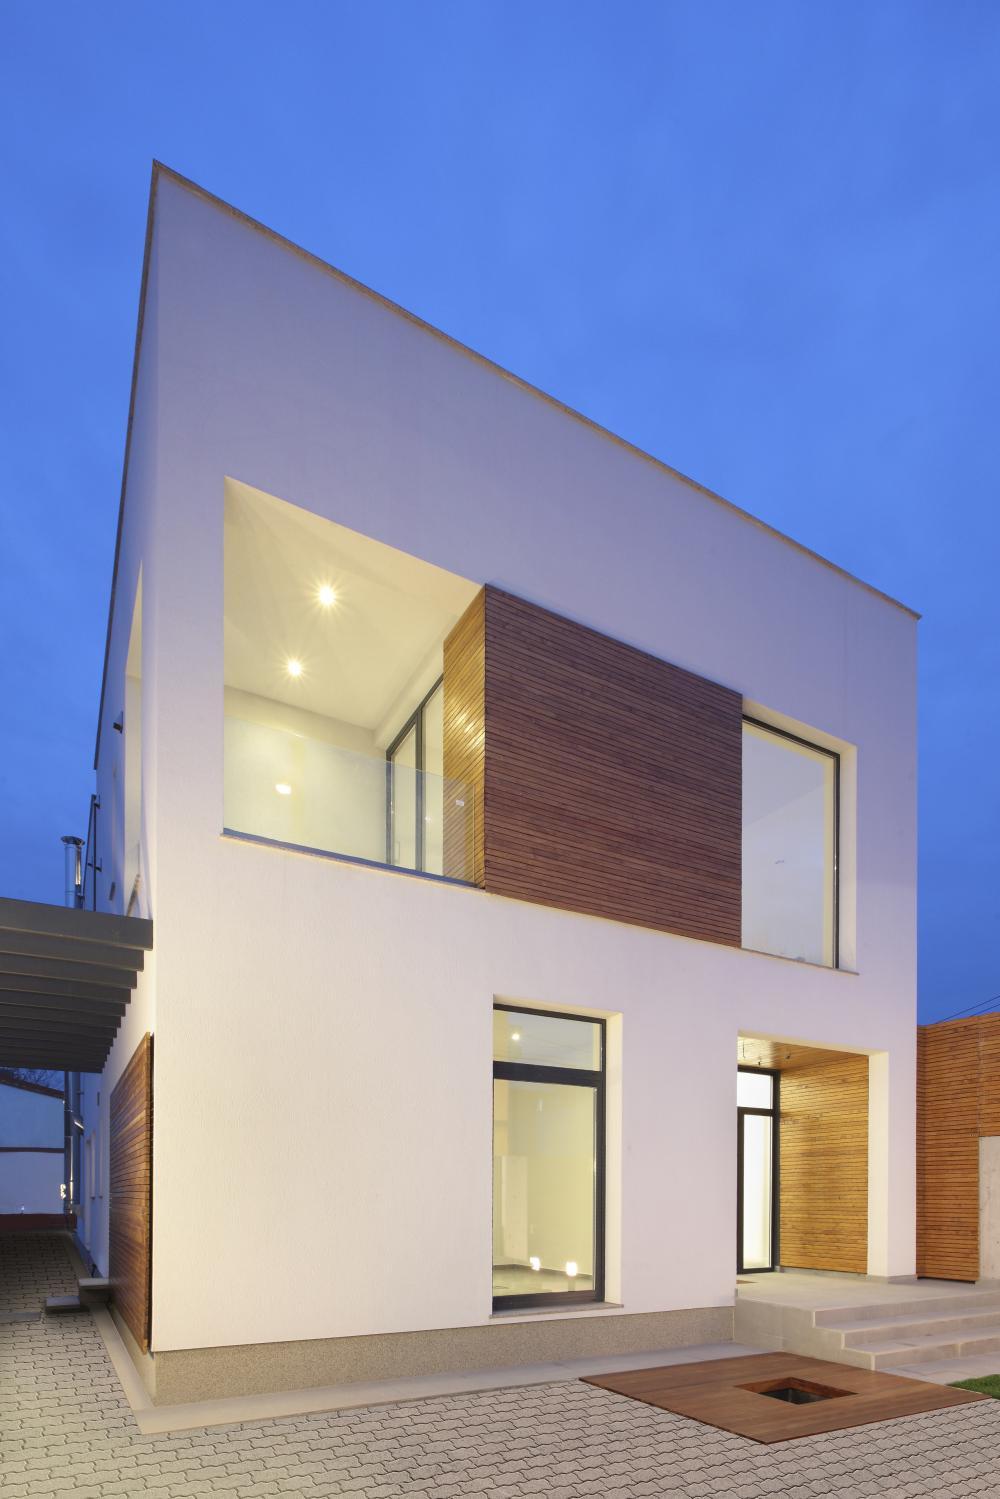 https://nbc-arhitect.ro/wp-content/uploads/2020/11/NBC-ARHITECT-_-residential-_-Mibe-House-_-exterior-view_master-photo.jpg